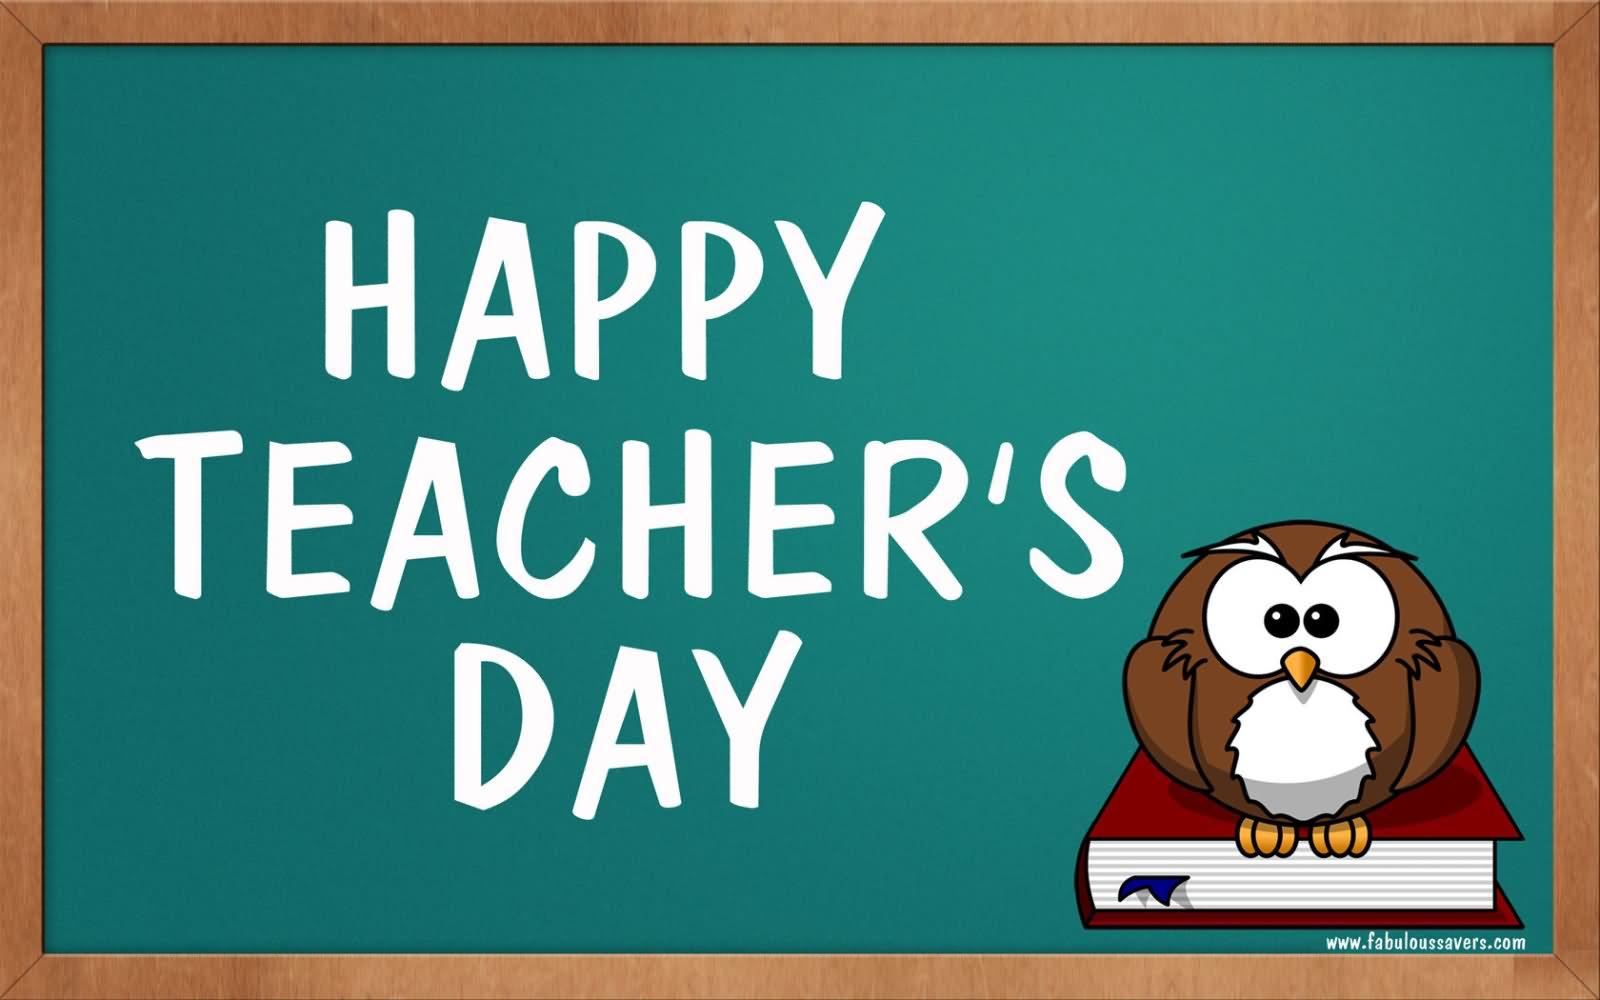 clipart for teachers day - photo #44